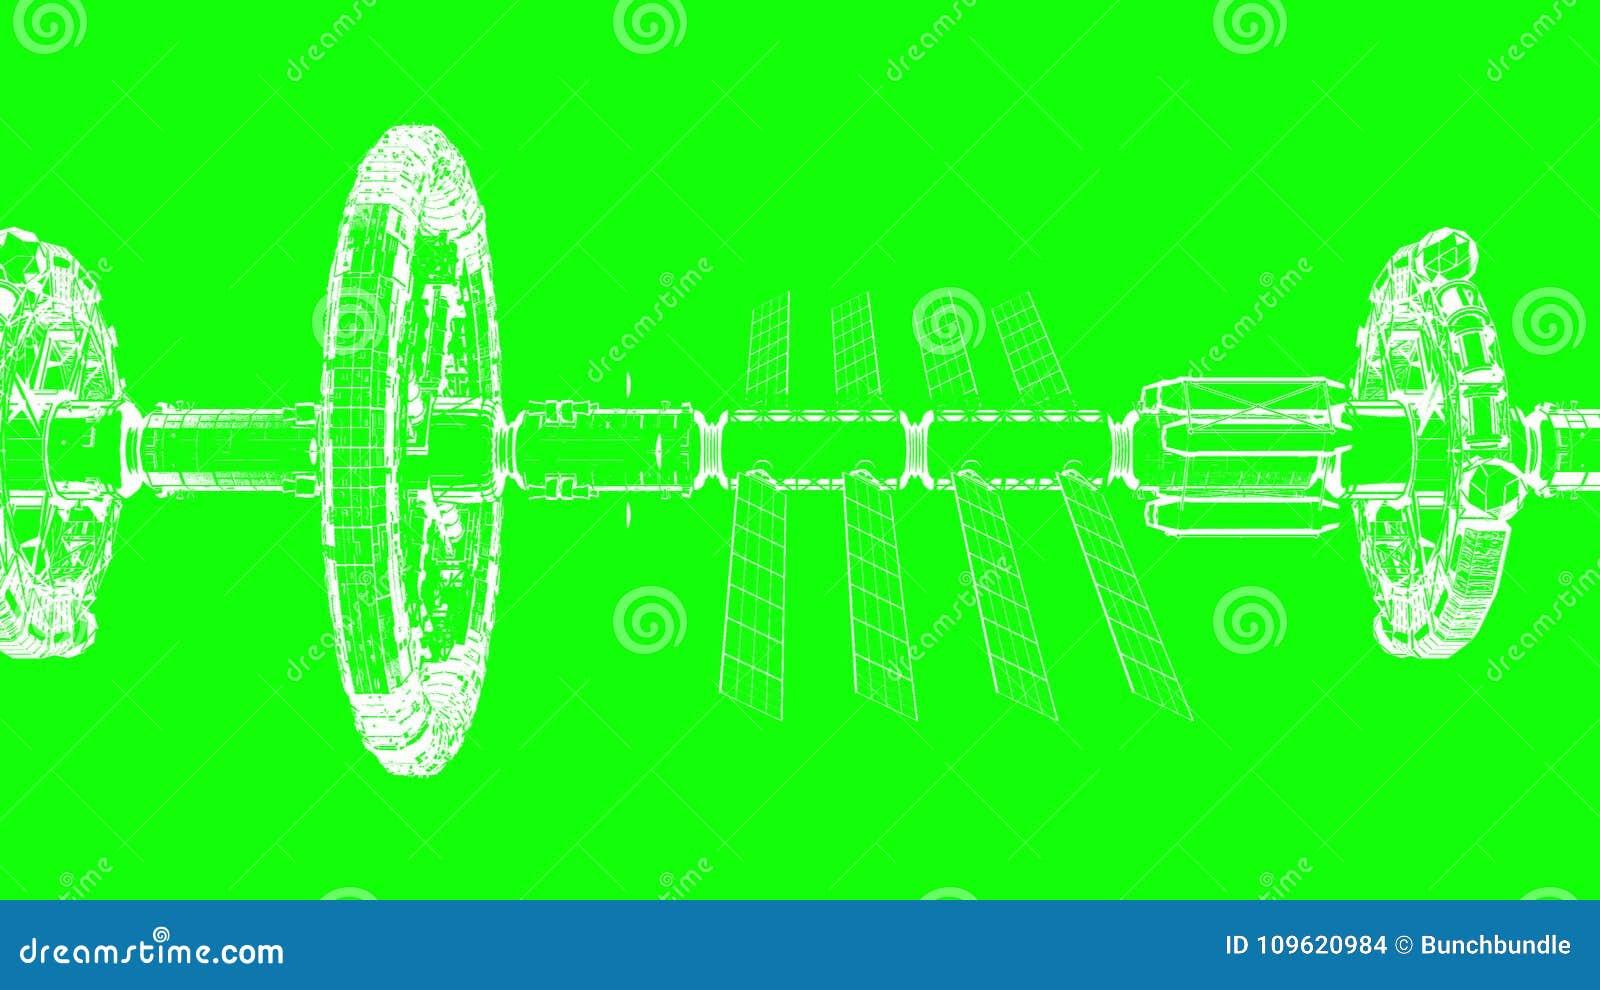 La Pantalla Verde Dibujo Técnico Abstracto Se Mueve Horizontalmente